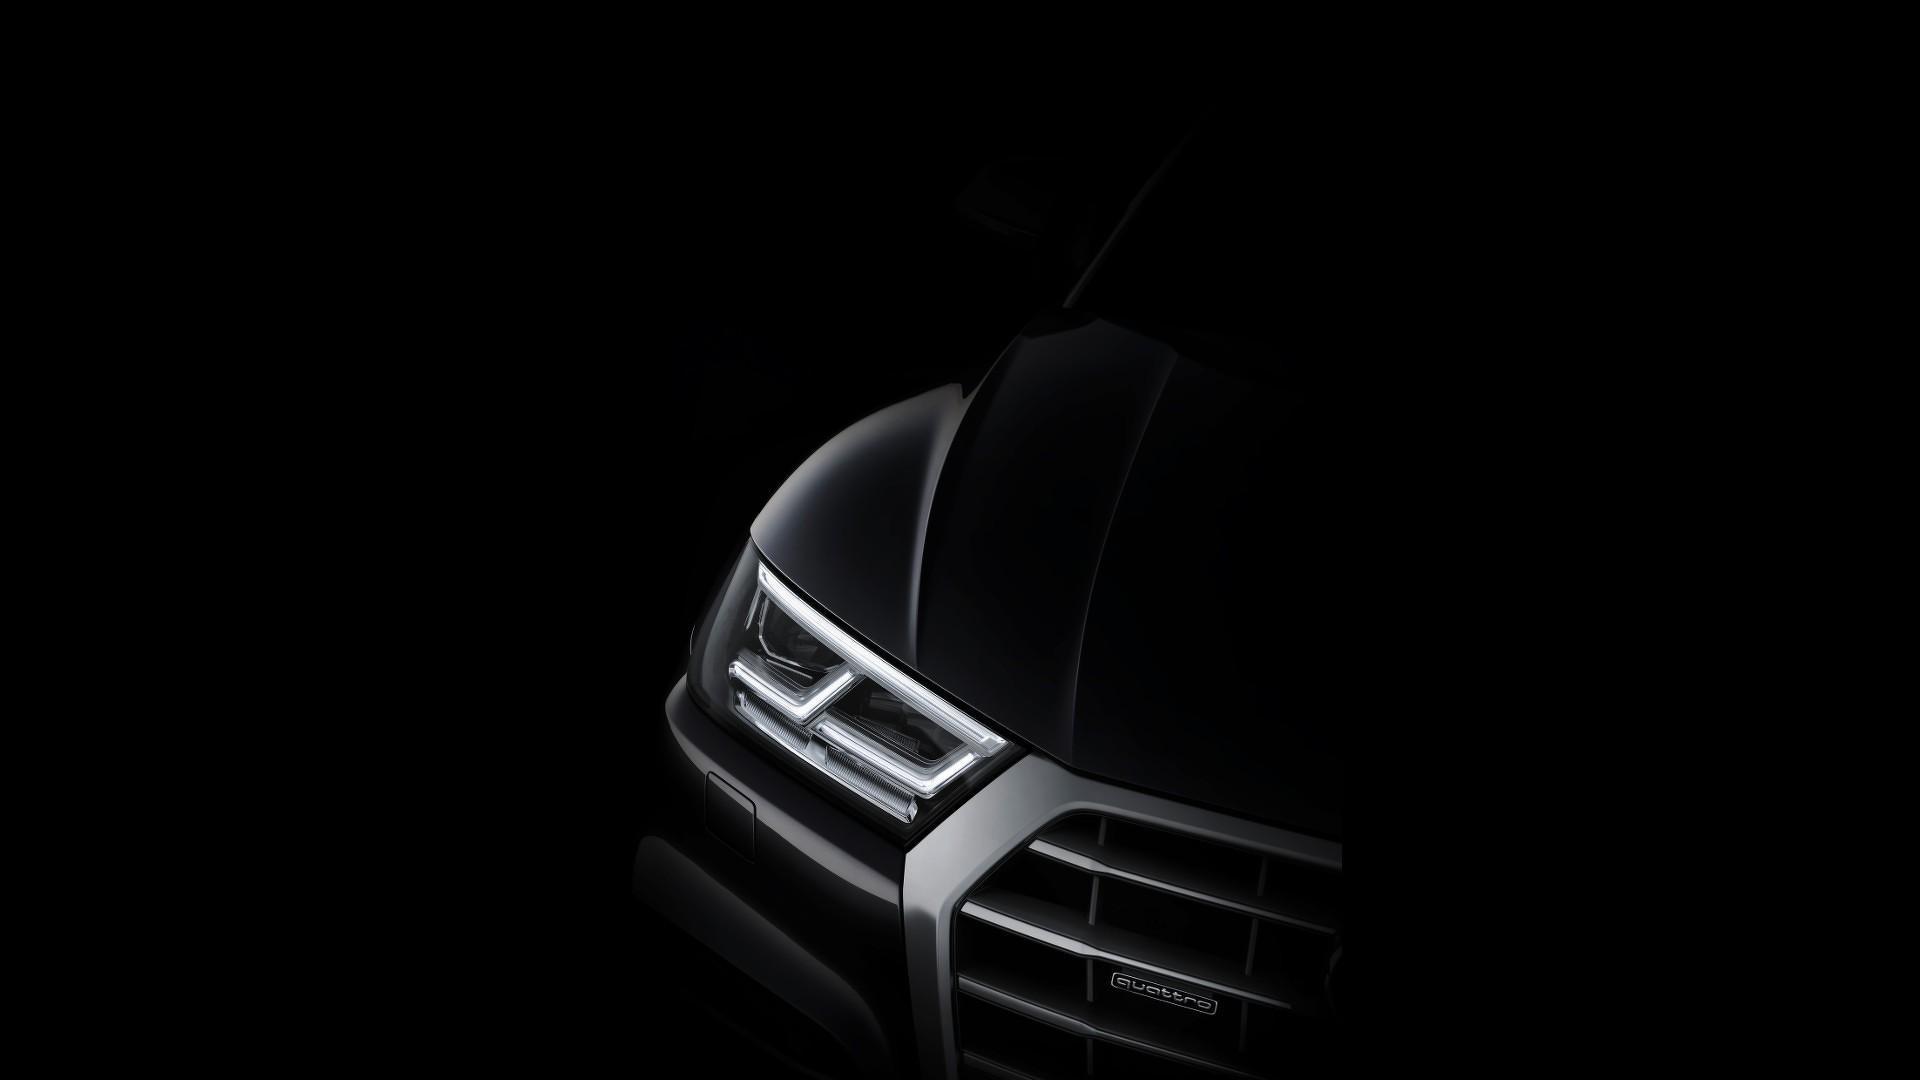 Audi Headlights Wallpapers - Wallpaper Cave